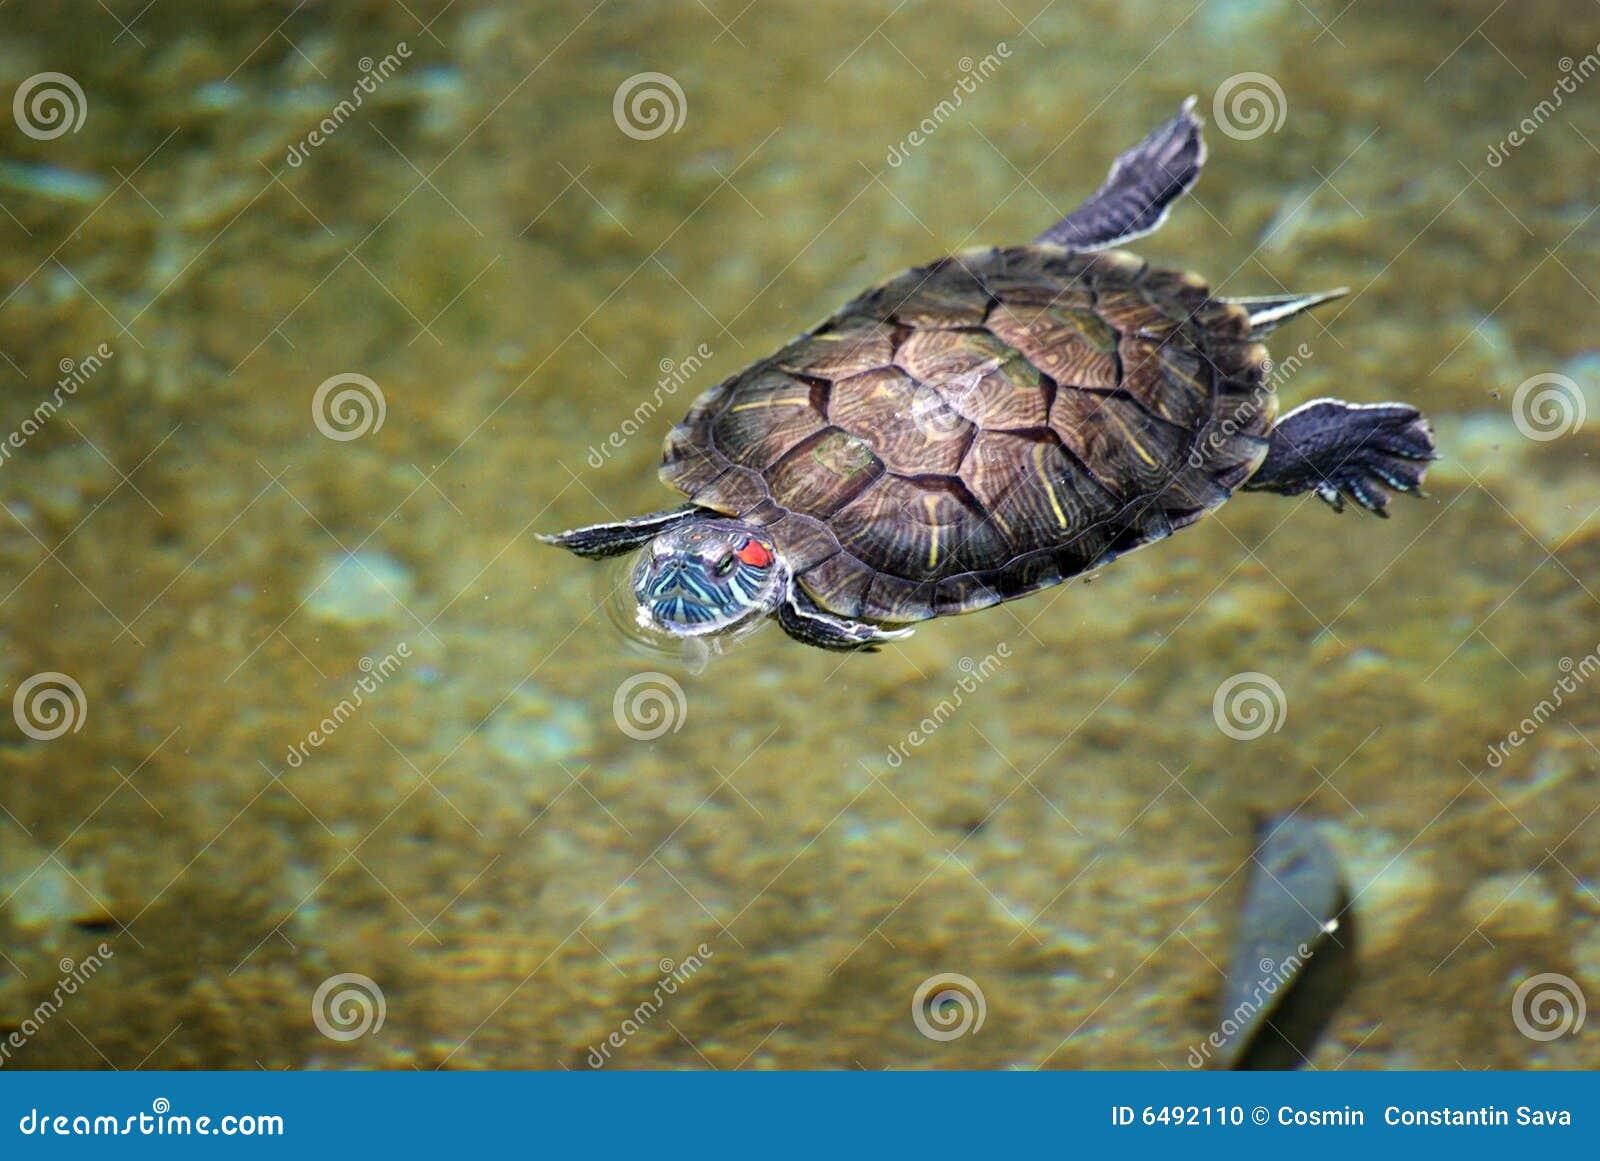 Tortoise Swimming In Water Stock Photo - Image: 6492110